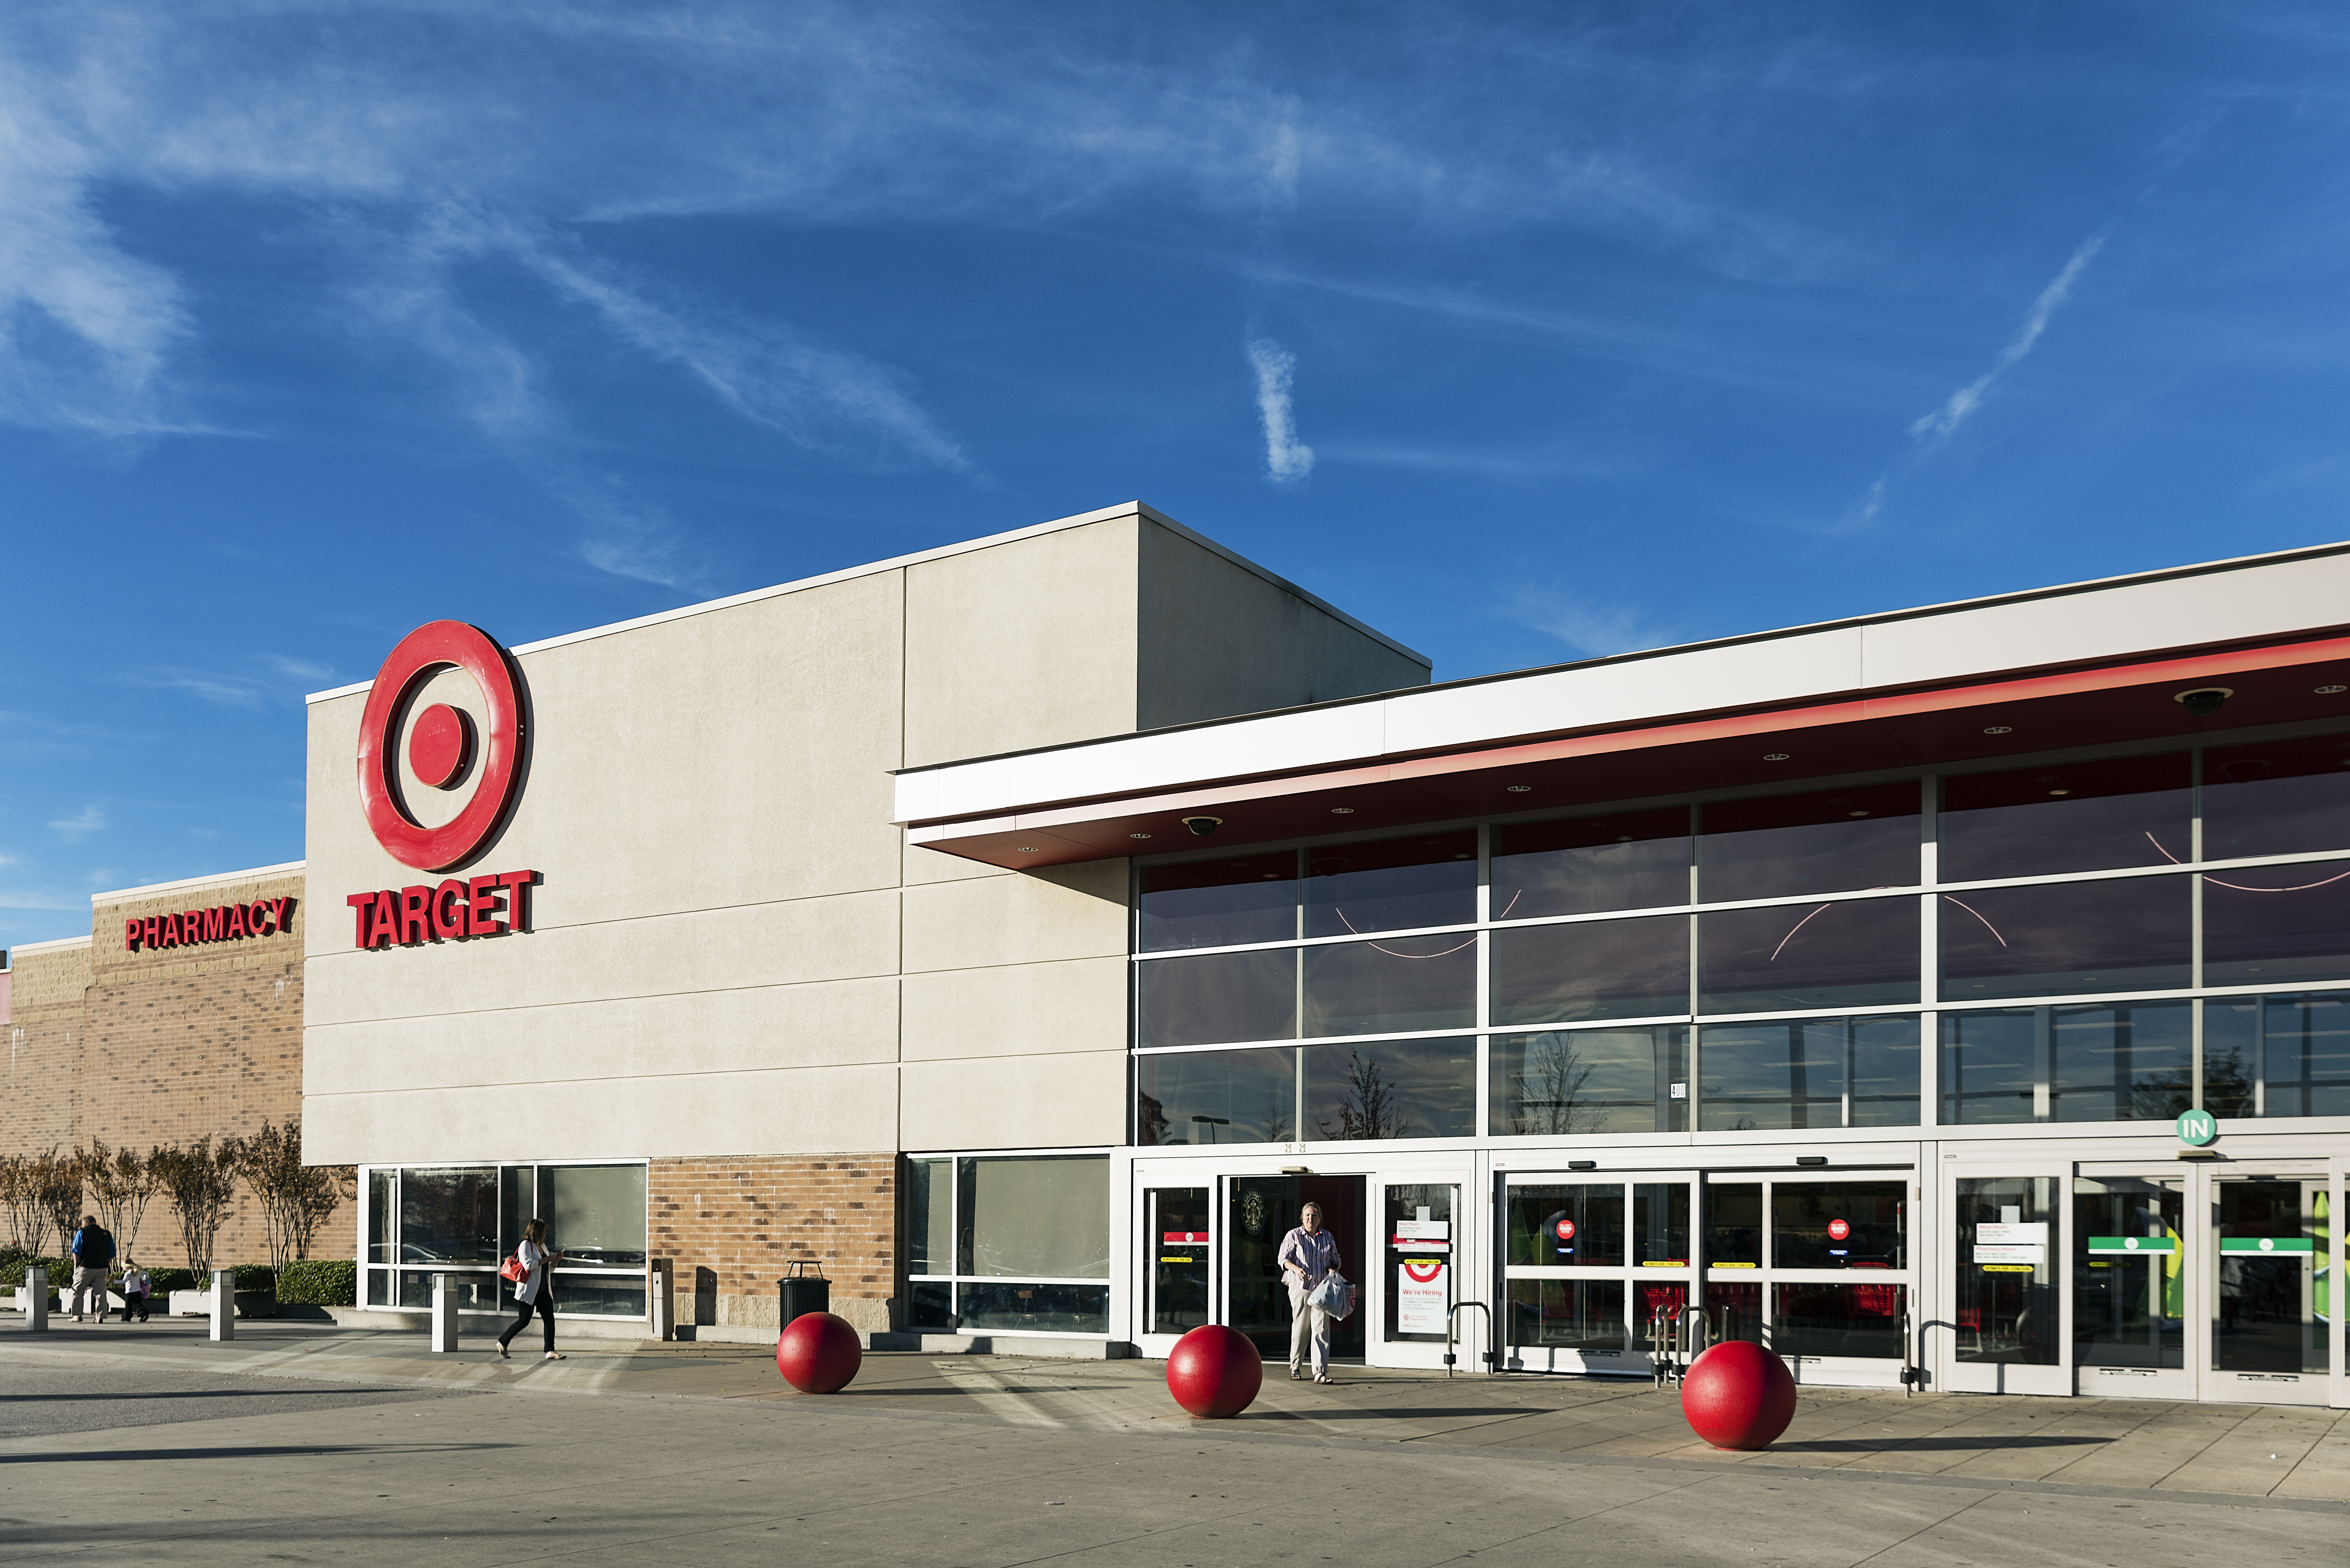 Target Store exterior.